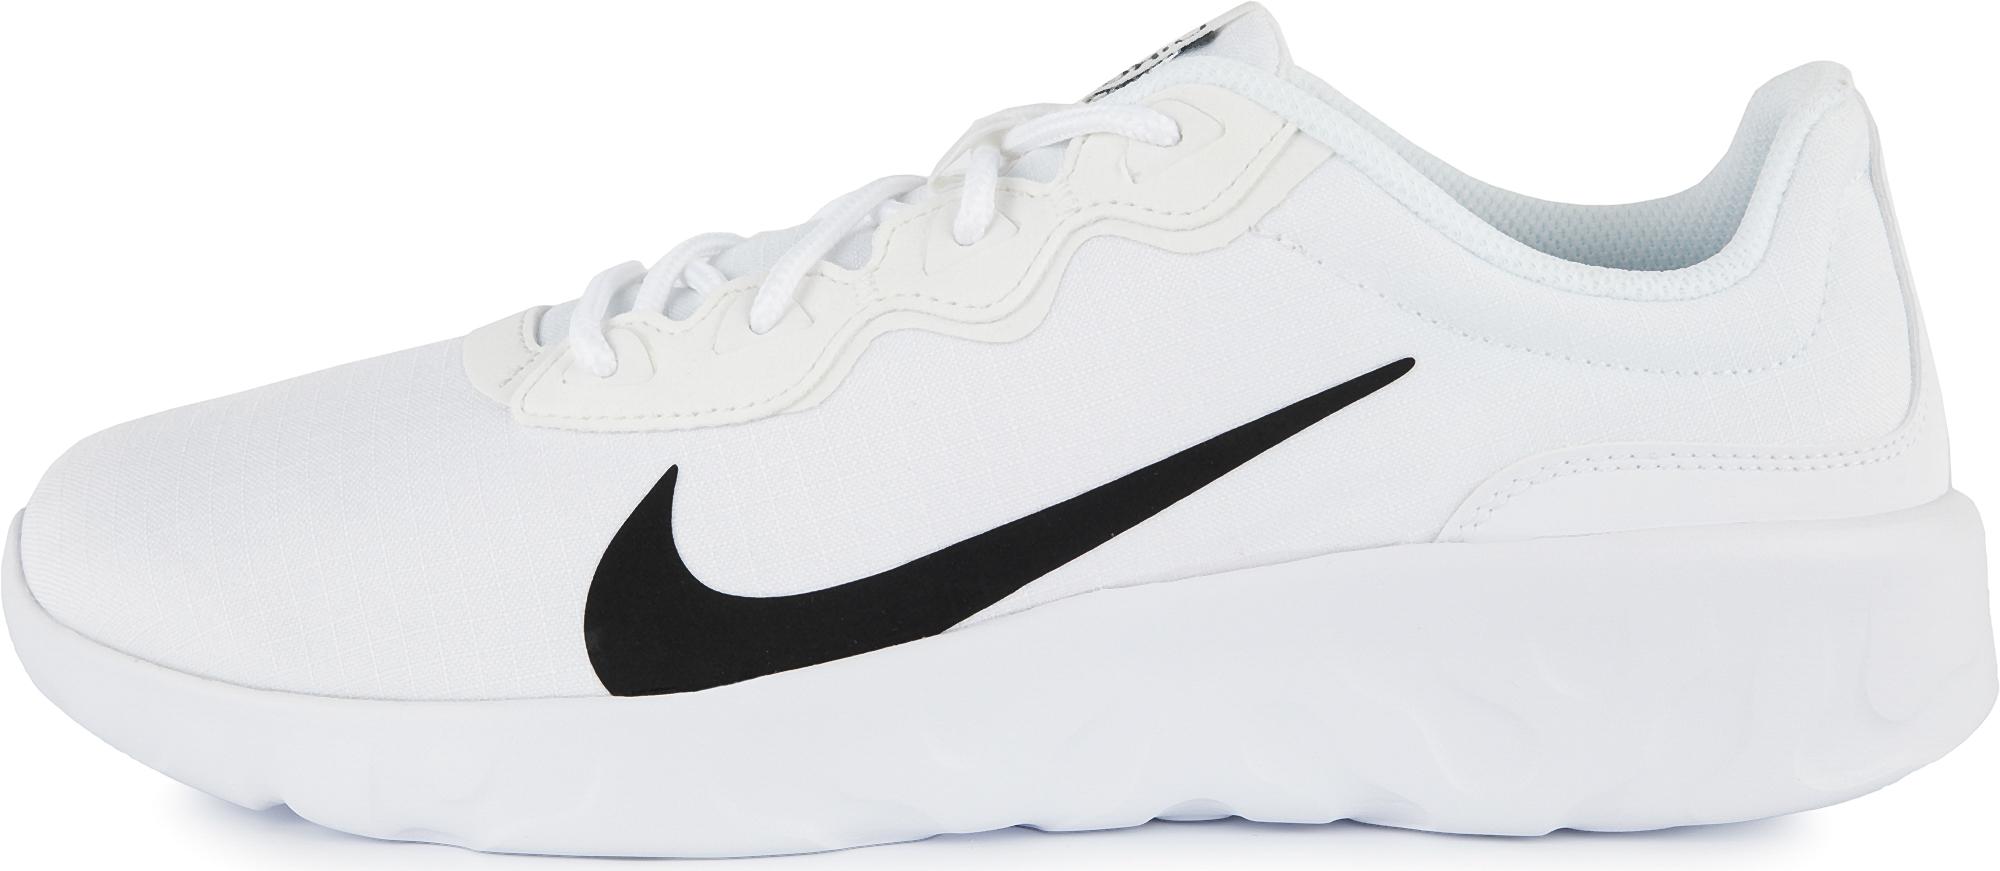 Nike Кроссовки мужские Explore Strada, размер 46,5